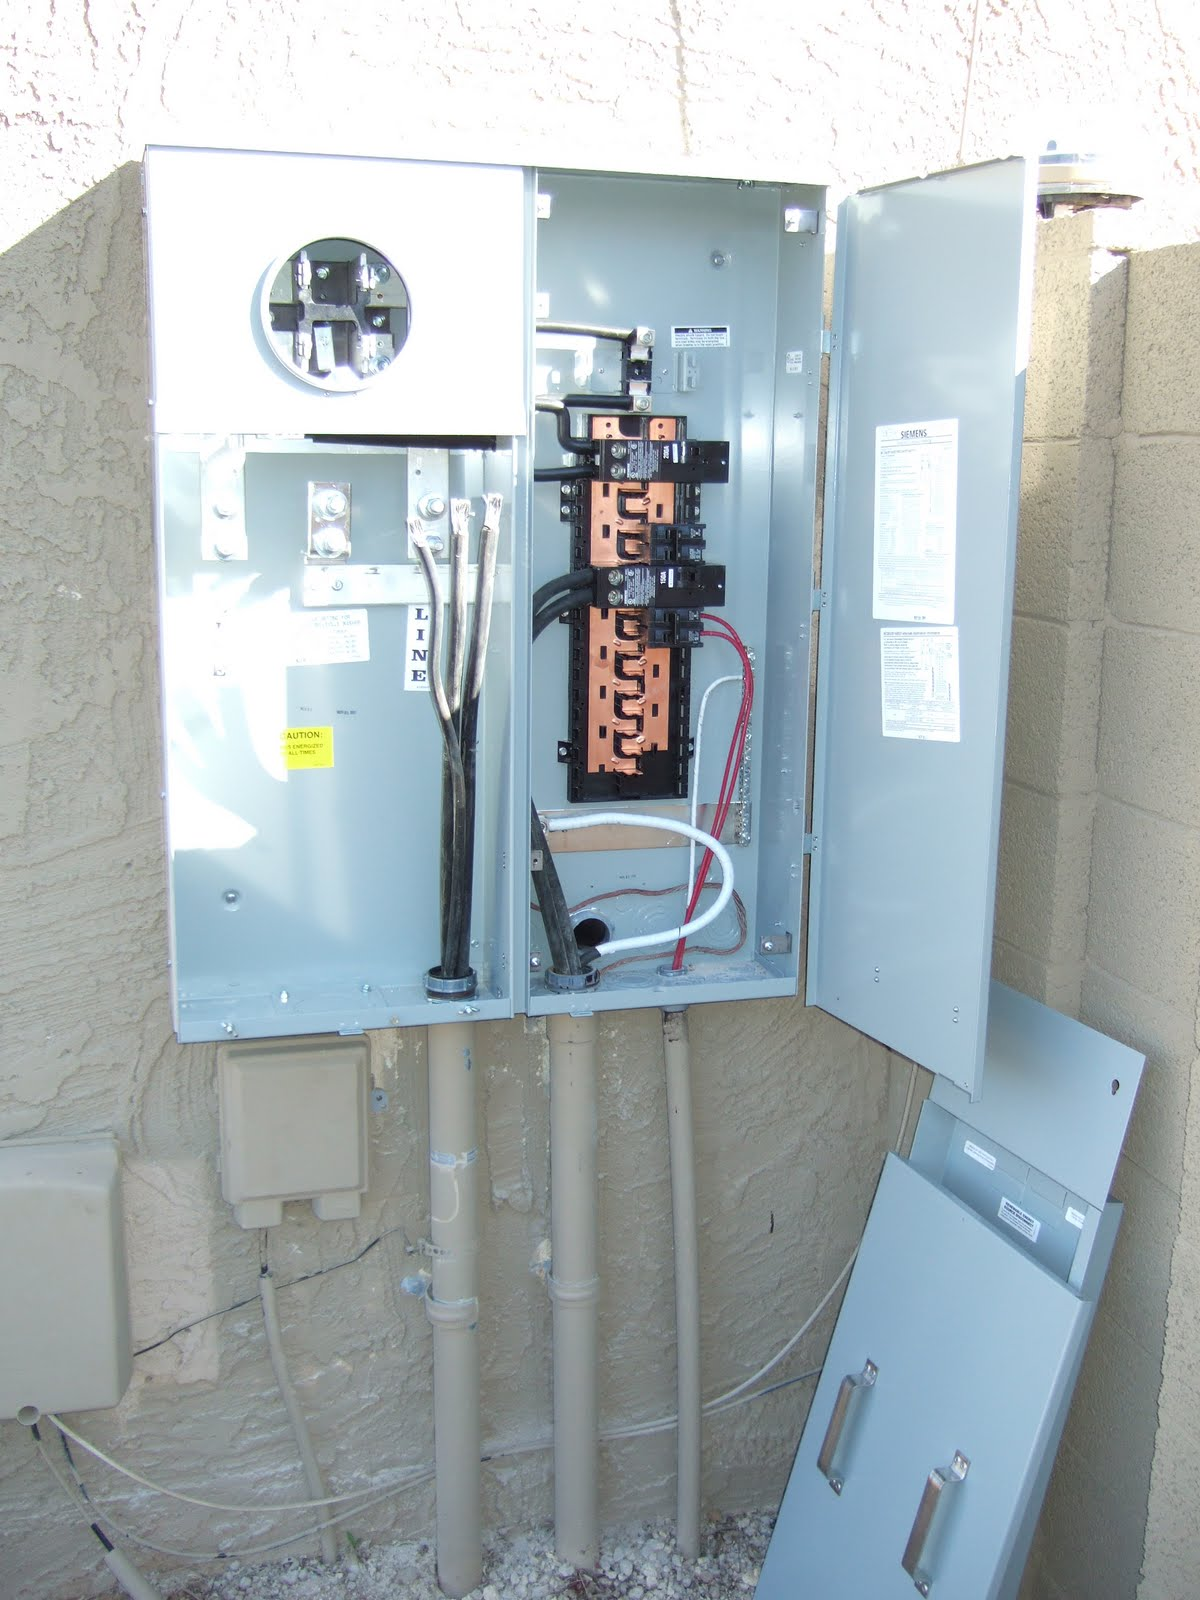 400 amp service diagram residential wiring headlight relay azben meter panel installed